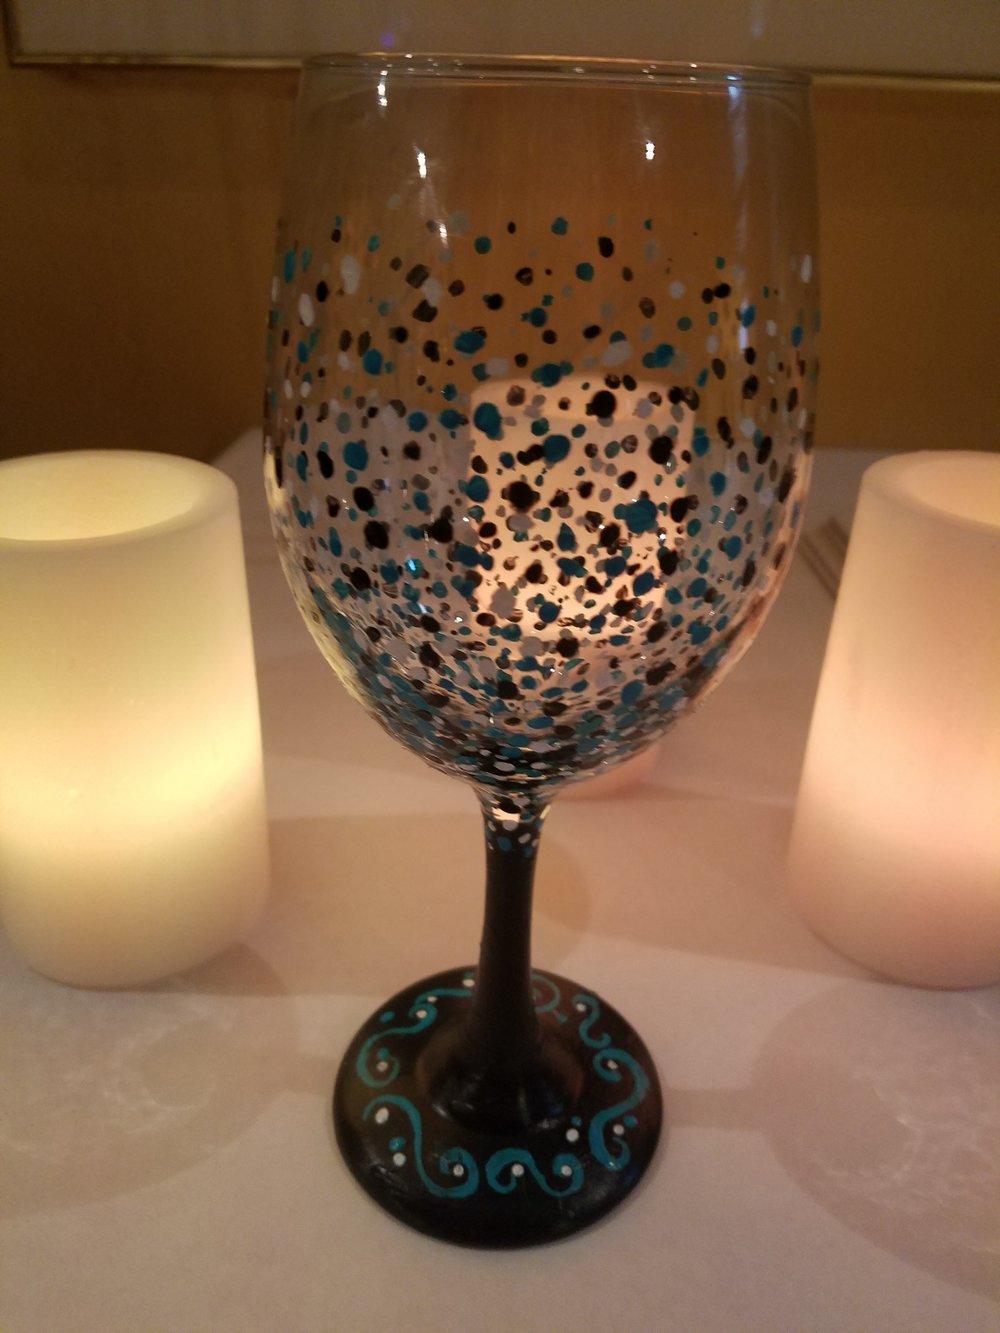 wine glass offsite setup.jpg